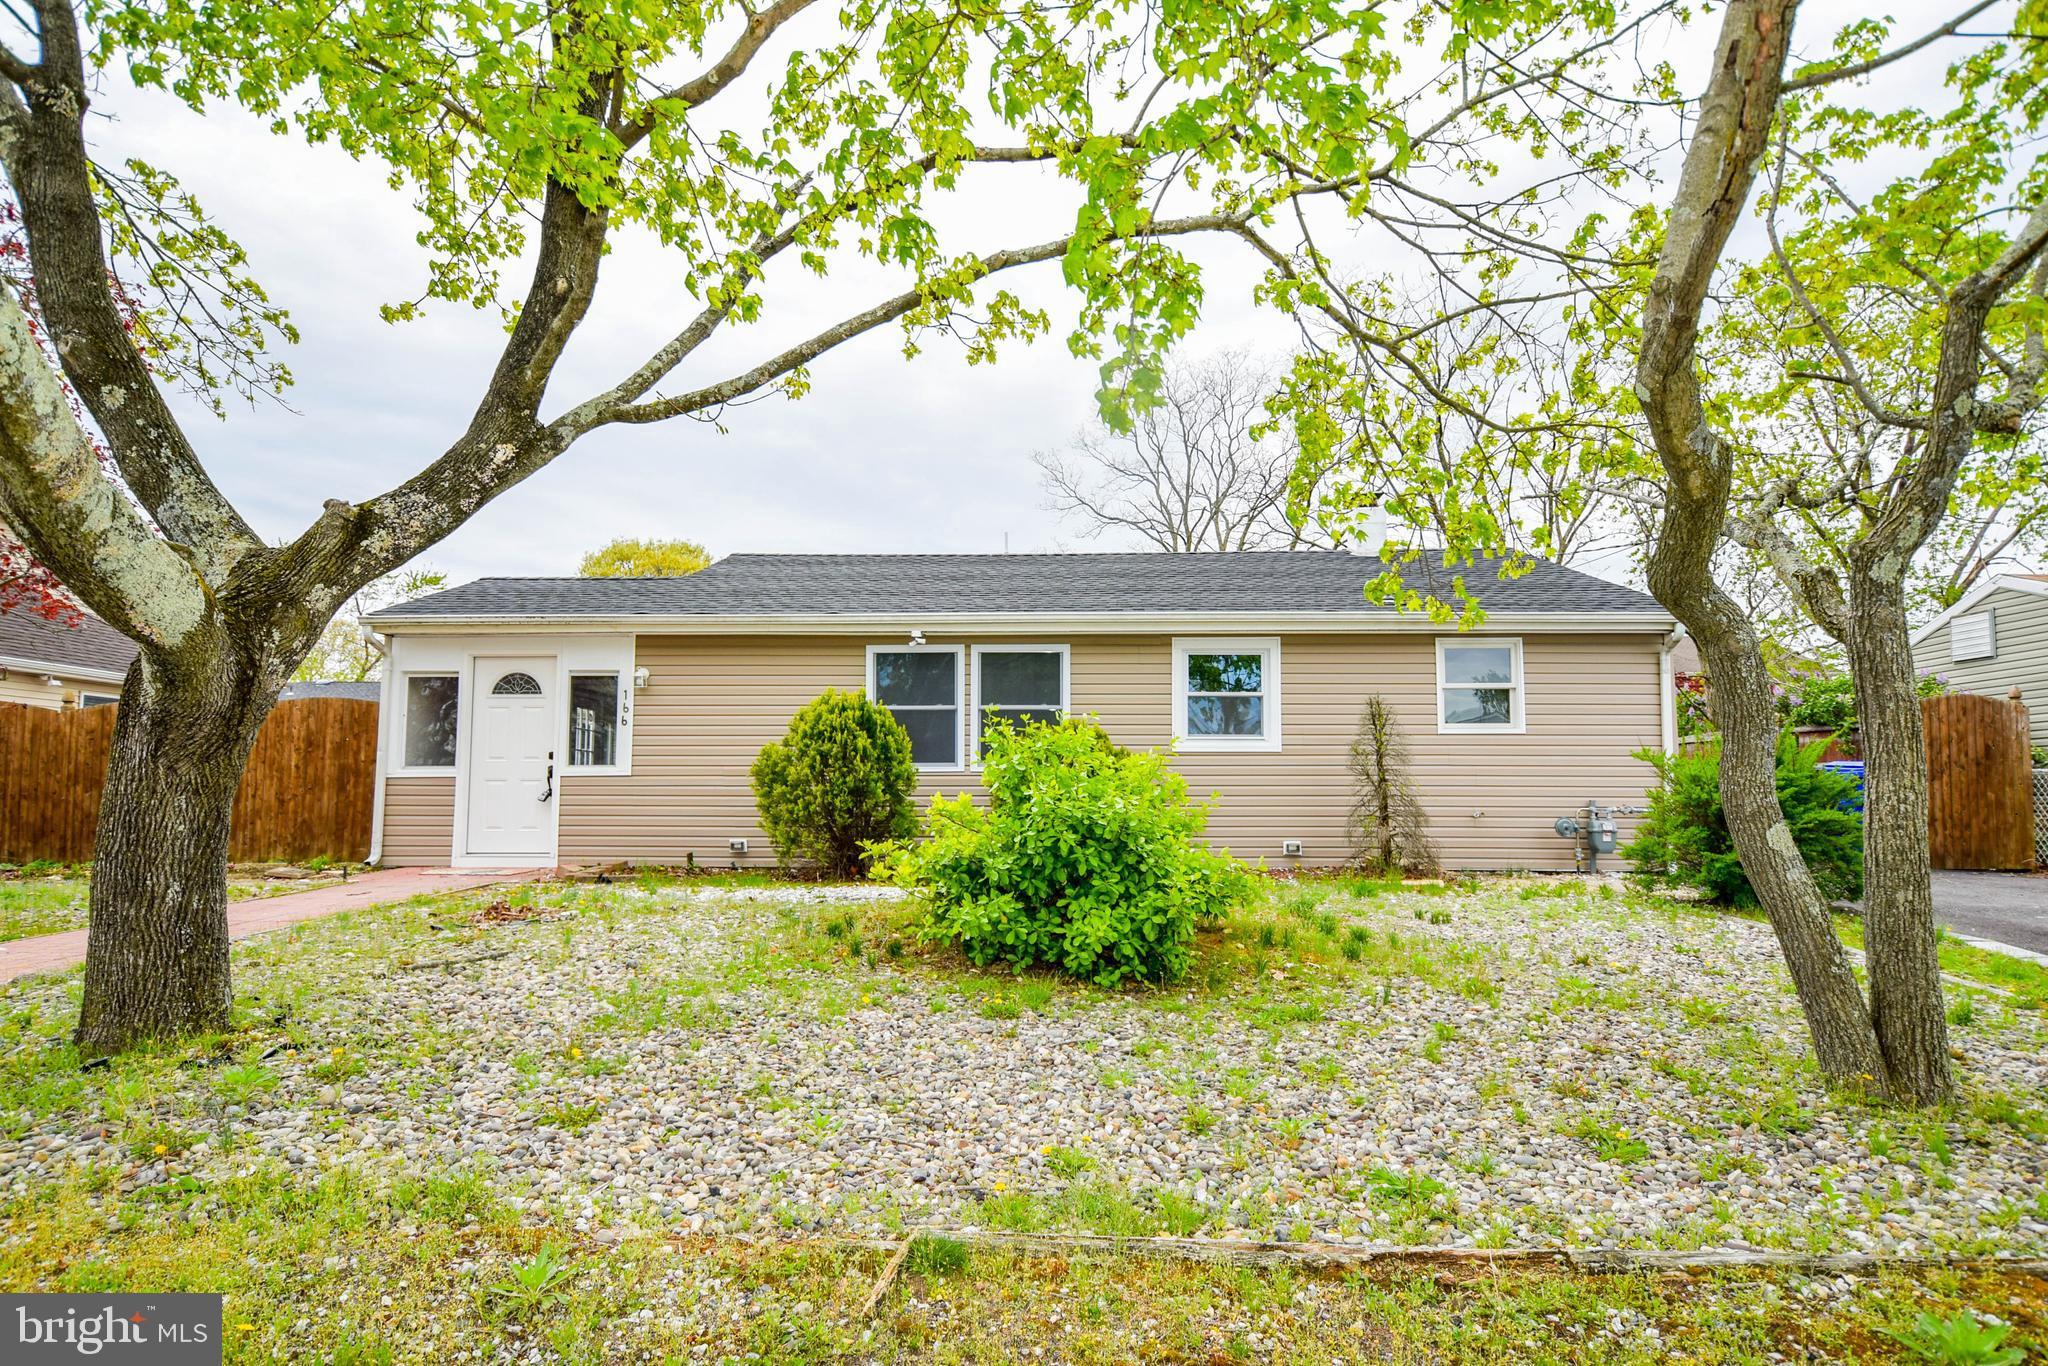 166 CLUB HOUSE, BRICK, NJ 08723